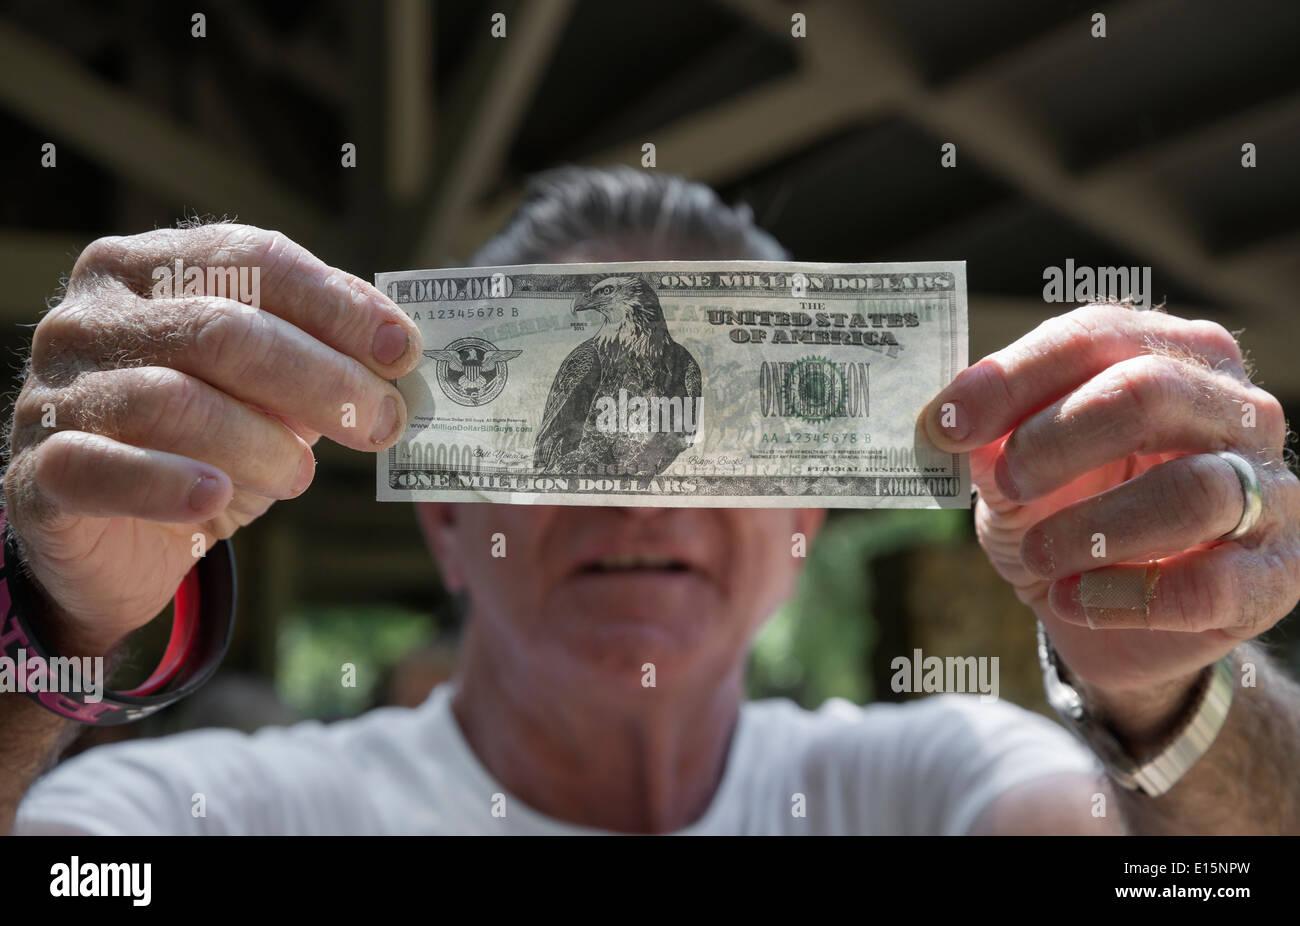 Man holds a fake million dollar bill. Stock Photo